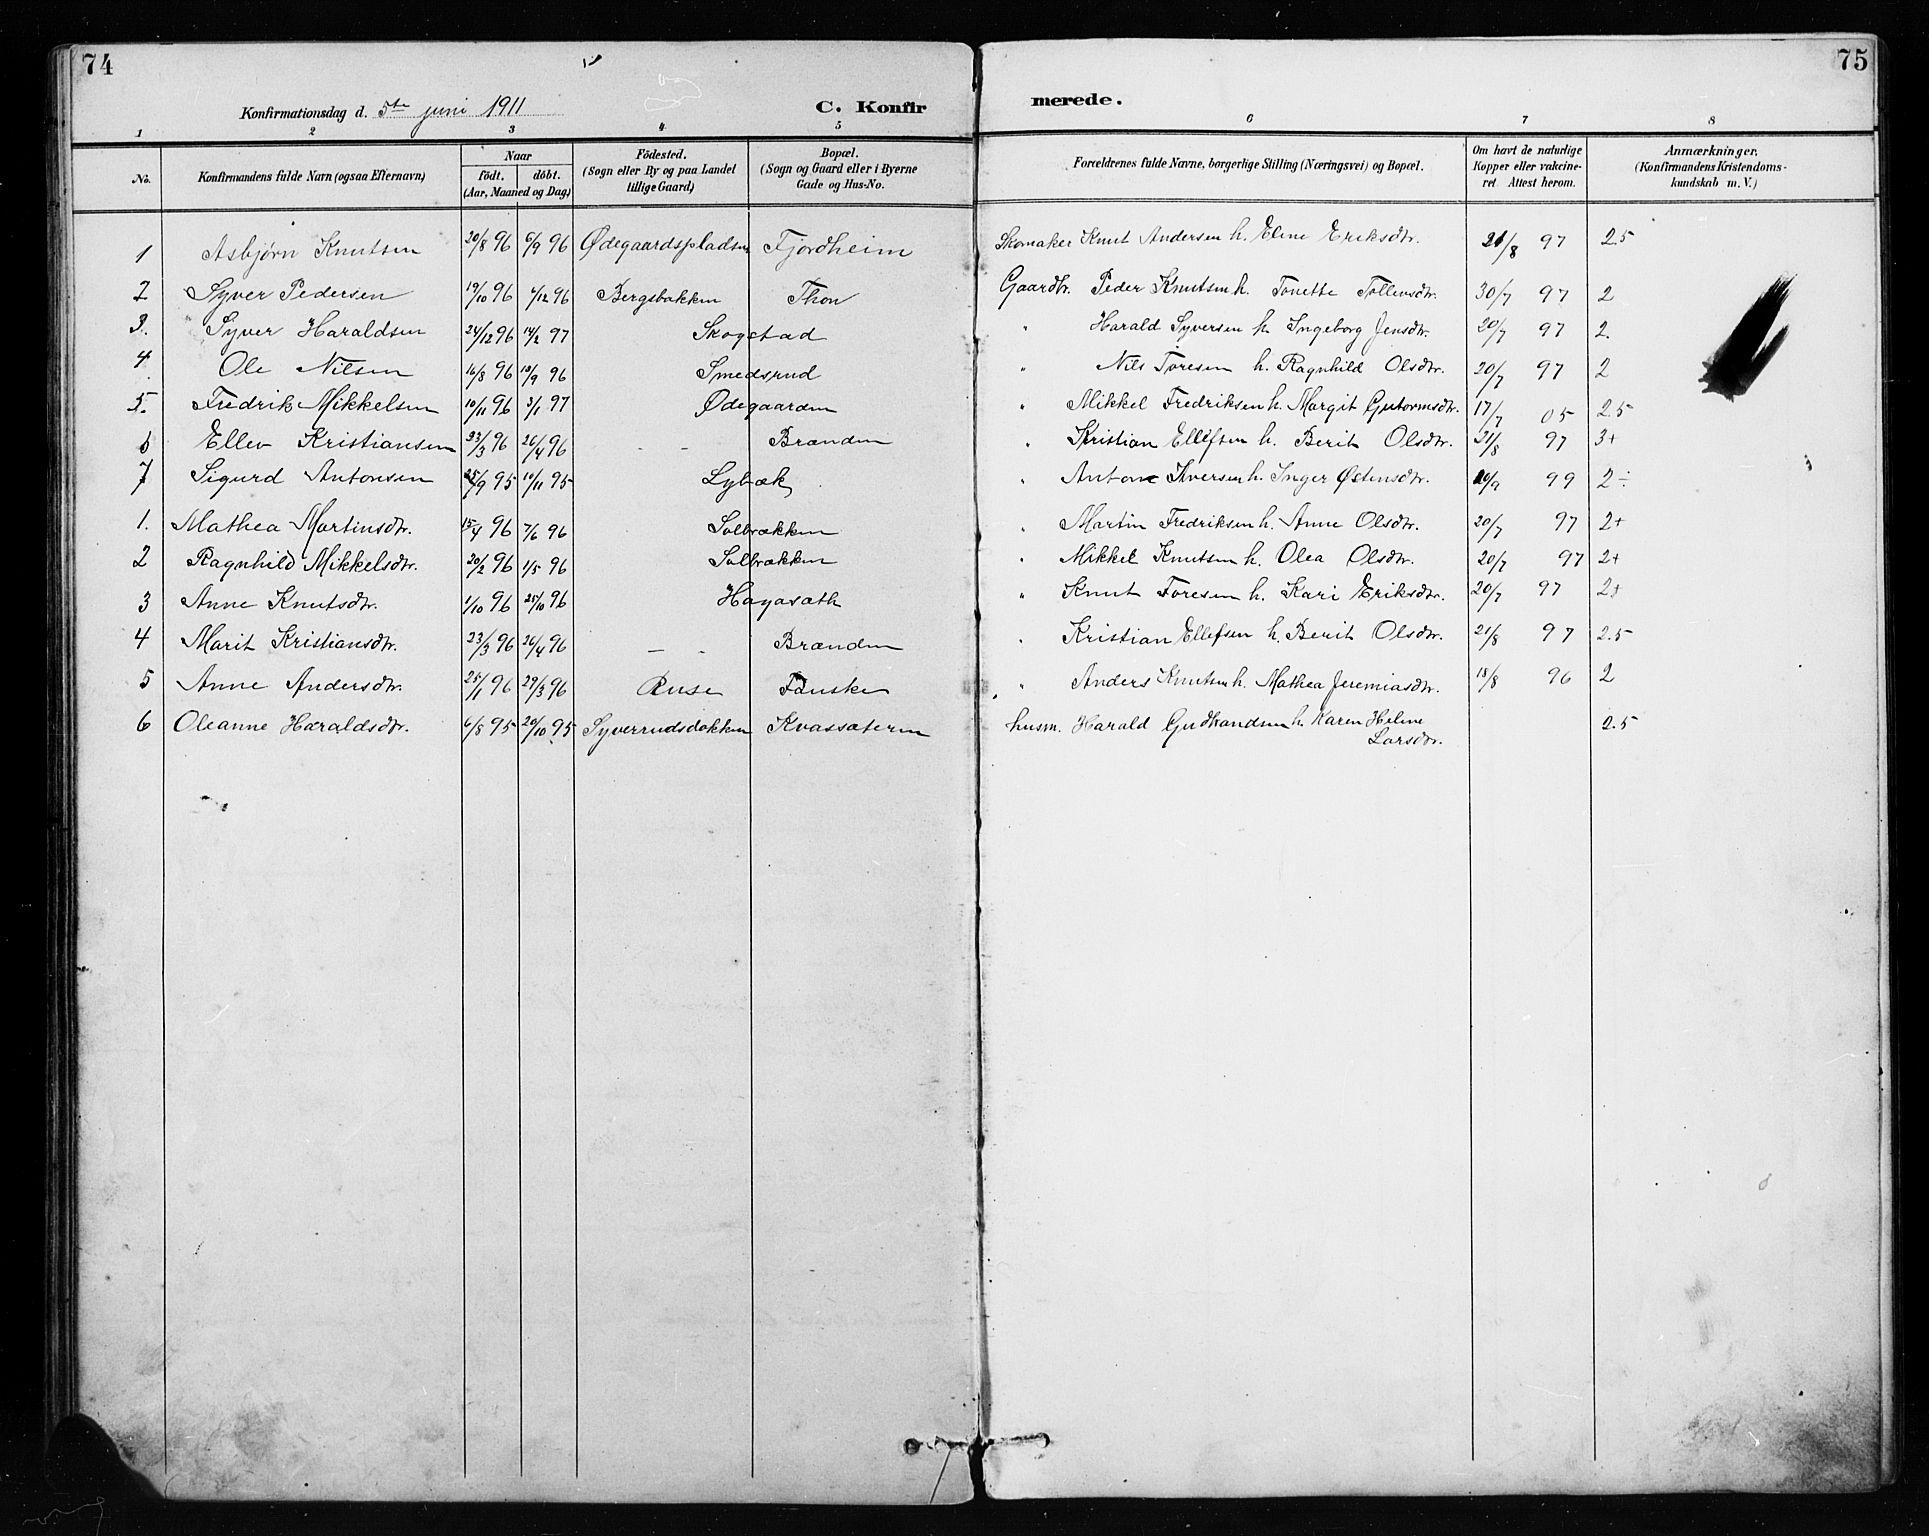 SAH, Etnedal prestekontor, H/Ha/Hab/Habb/L0001: Klokkerbok nr. II 1, 1894-1911, s. 74-75